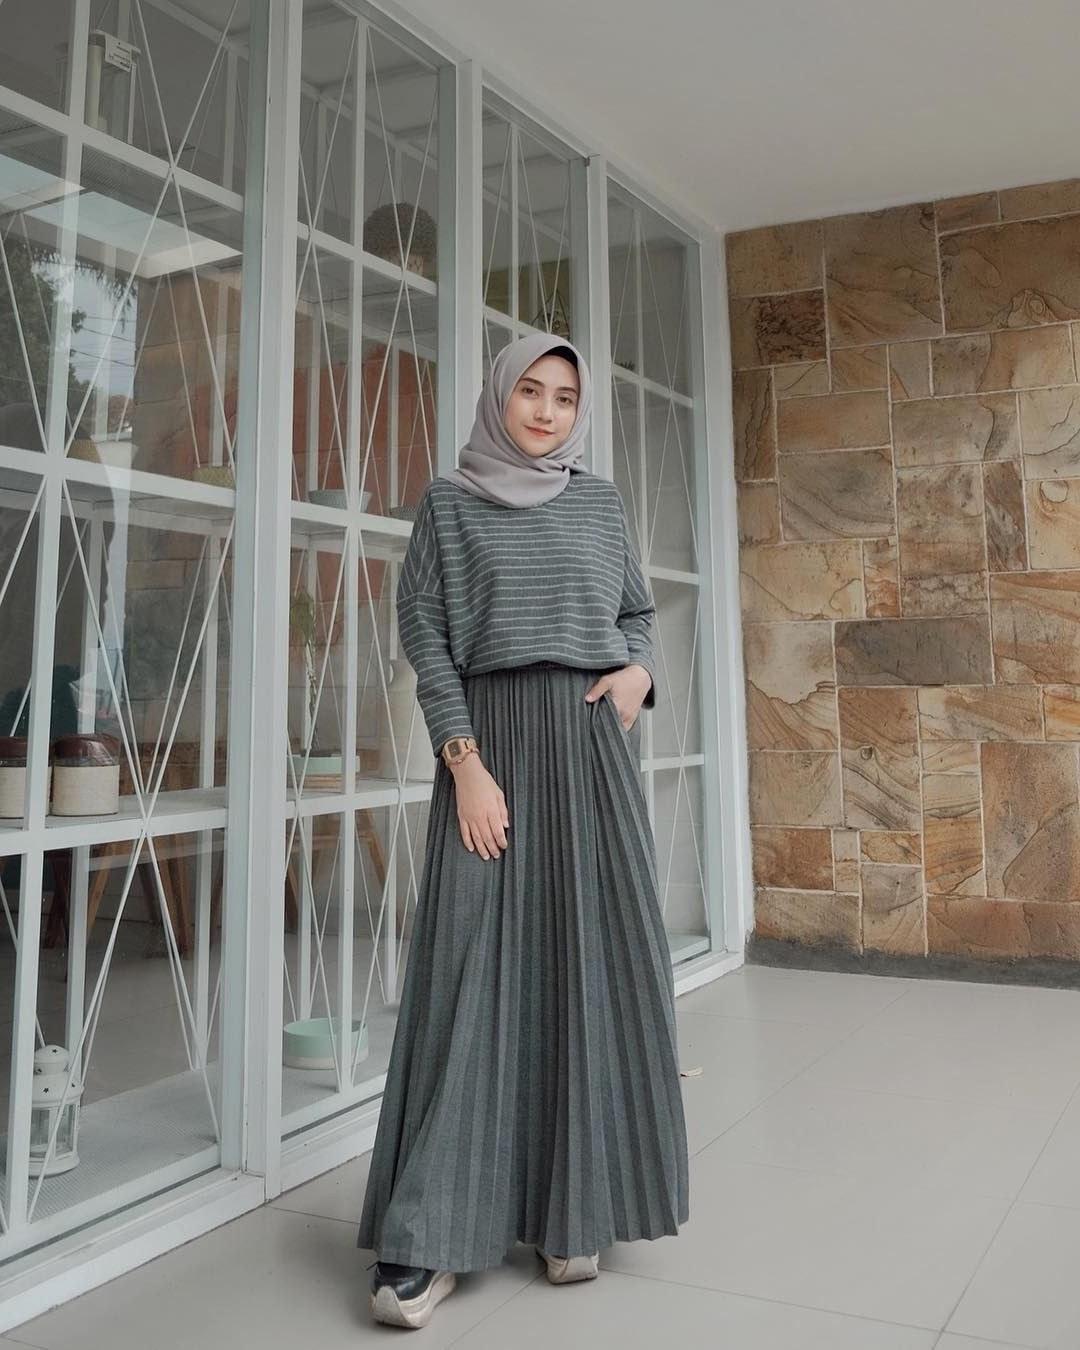 Model Motif Baju Lebaran 2019 9ddf Baju Muslim Lebaran Terbaru 2019